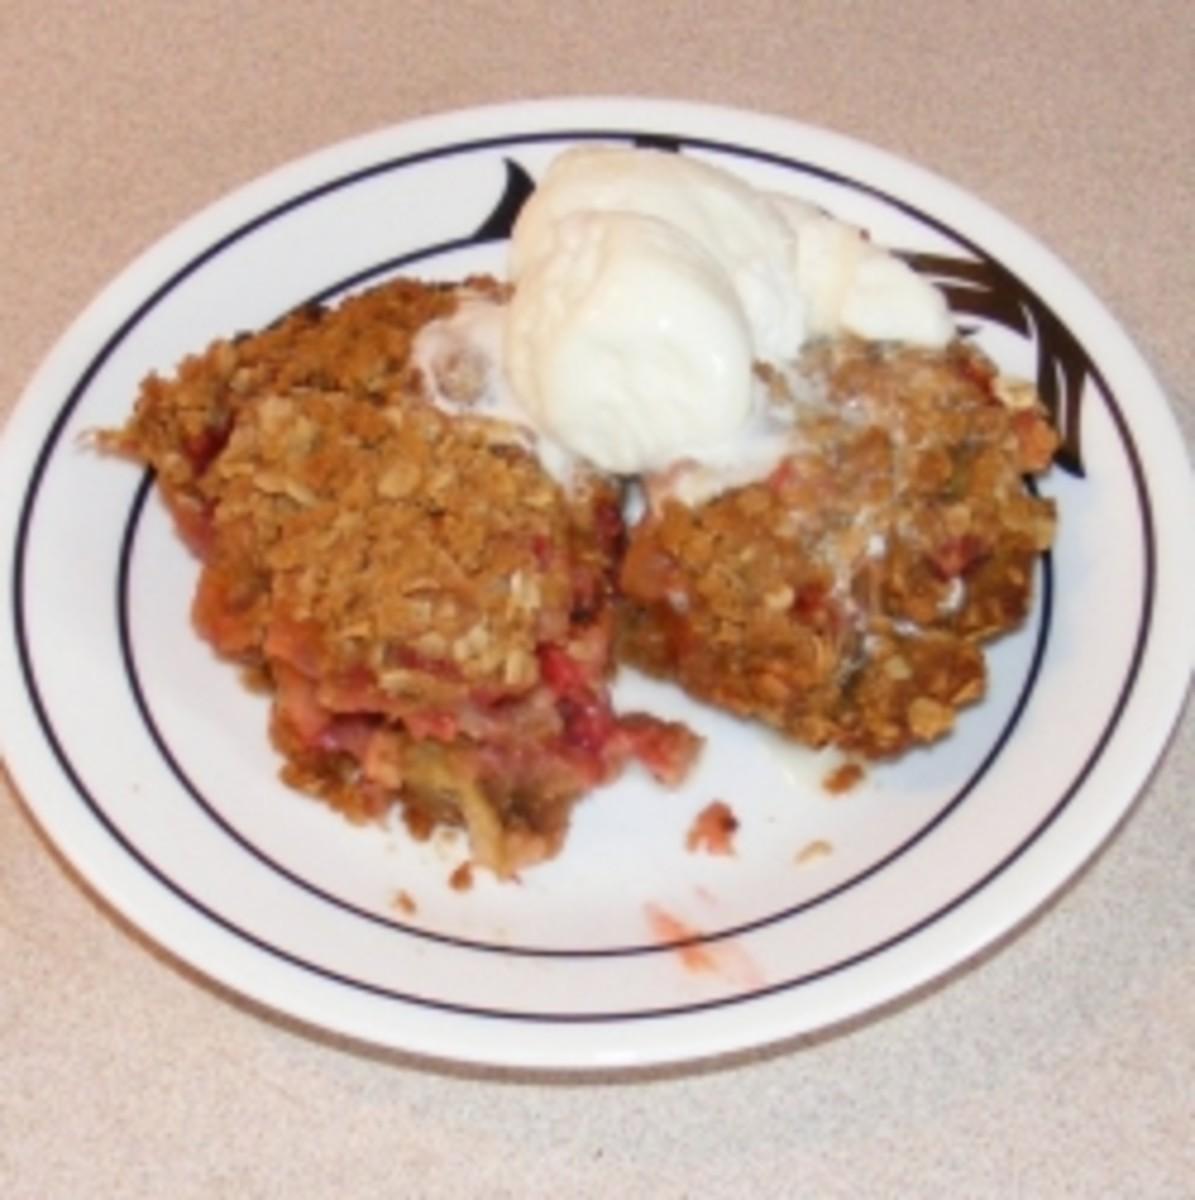 Oatmeal Recipes: Apple Crisp